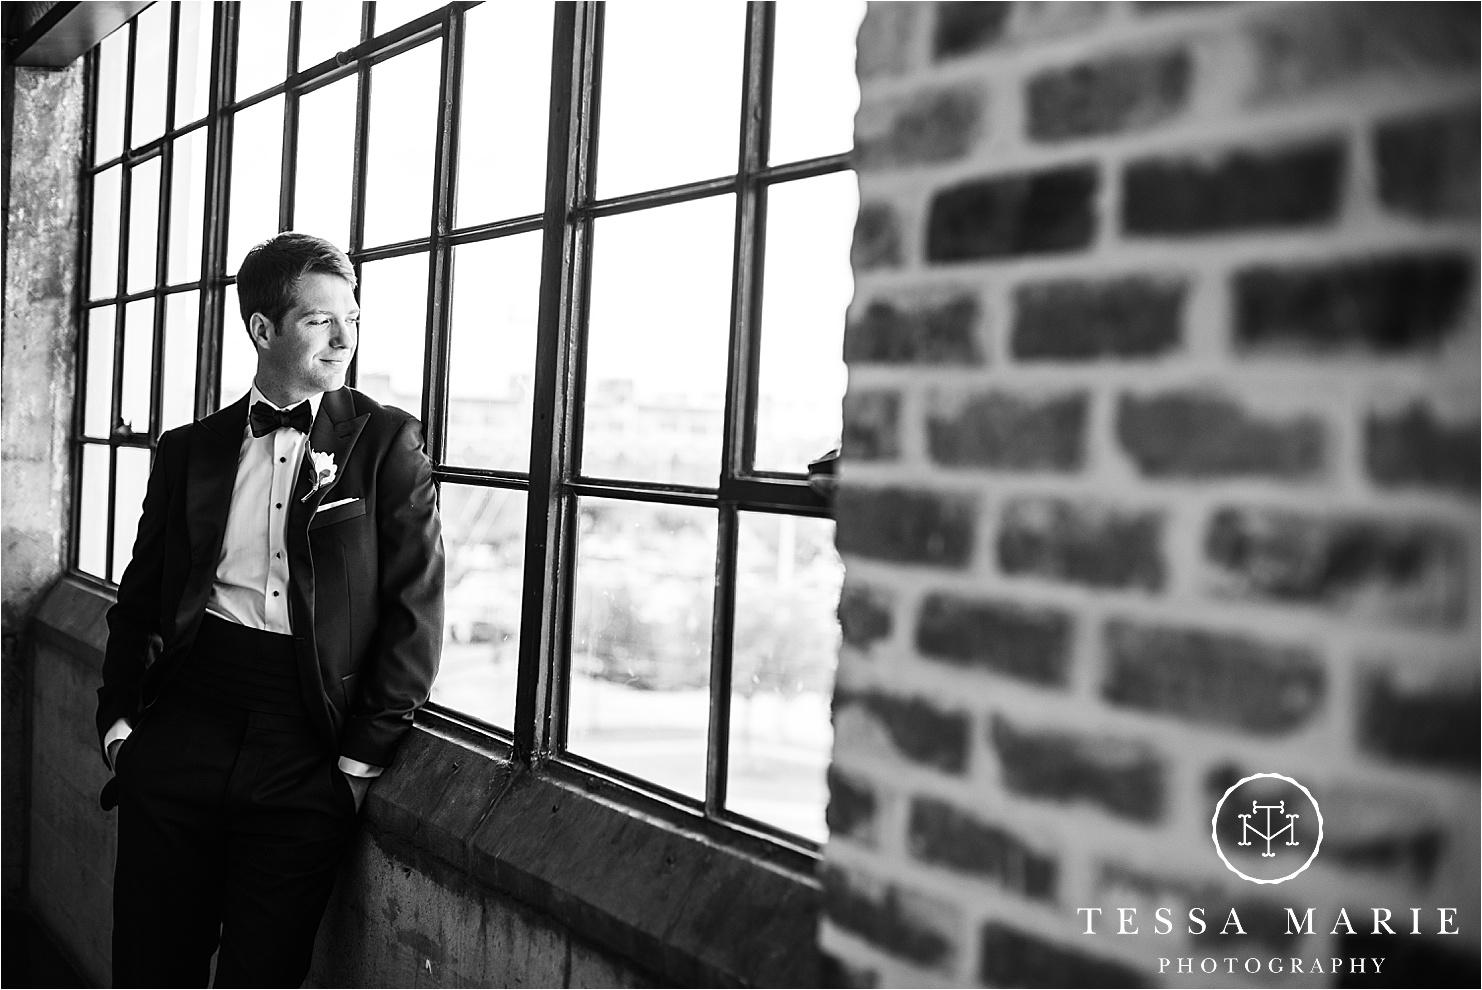 Tessa_marie_weddings_houston_wedding_photographer_The_astorian_0069.jpg